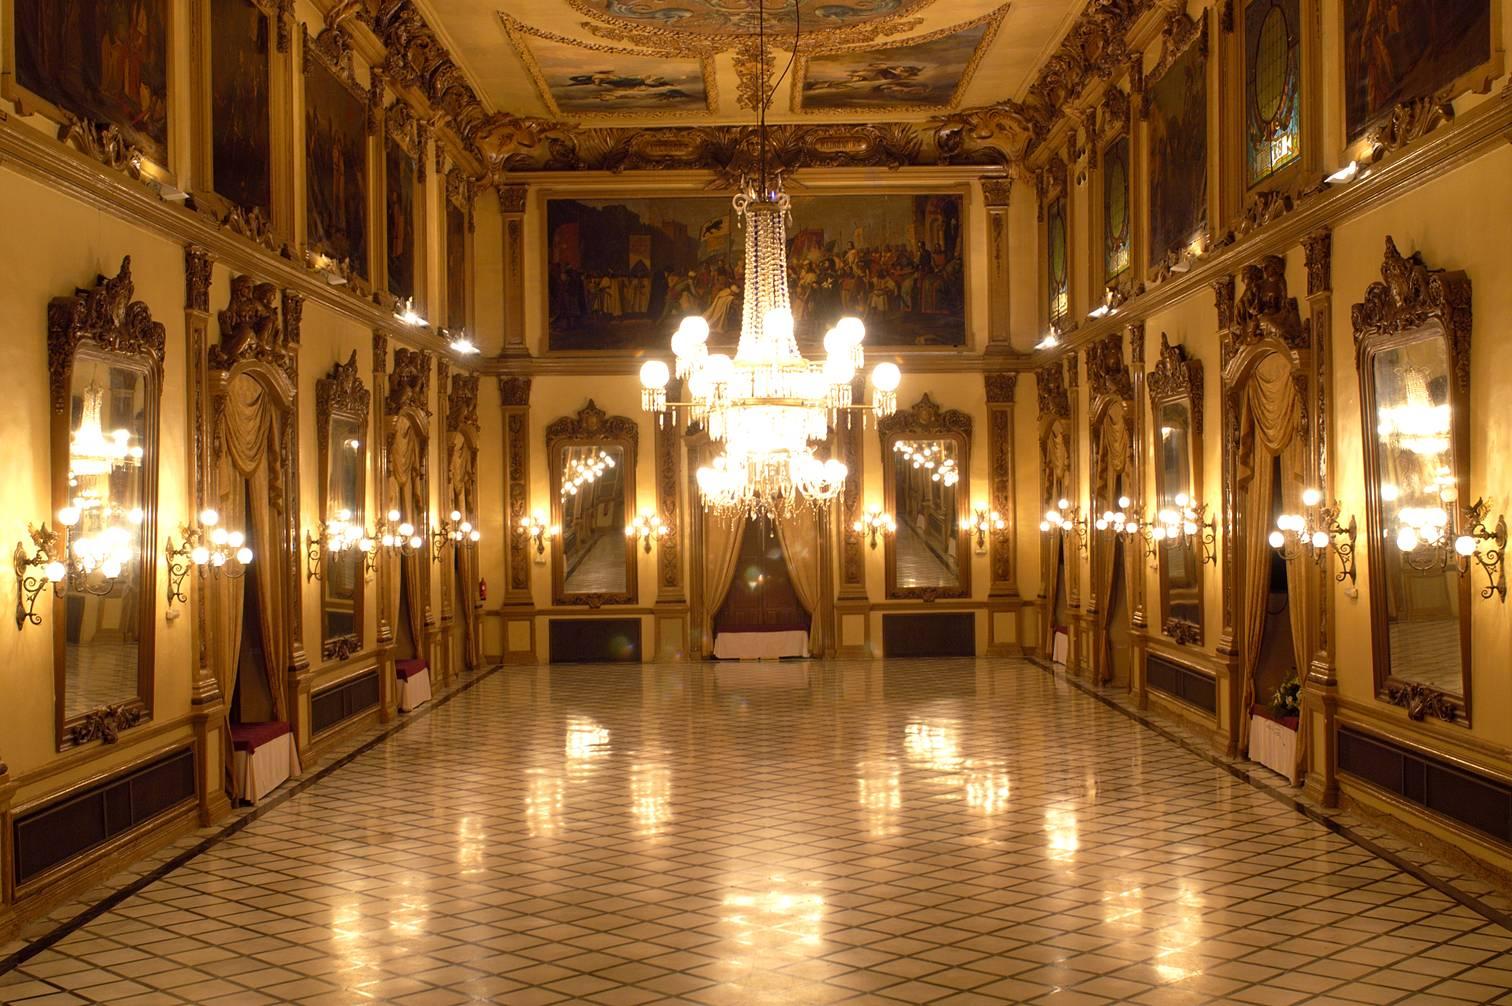 File:Salón Liceo - Real Círculo de la Amistad - Córdoba (España).jpg - Wikimedia Commons